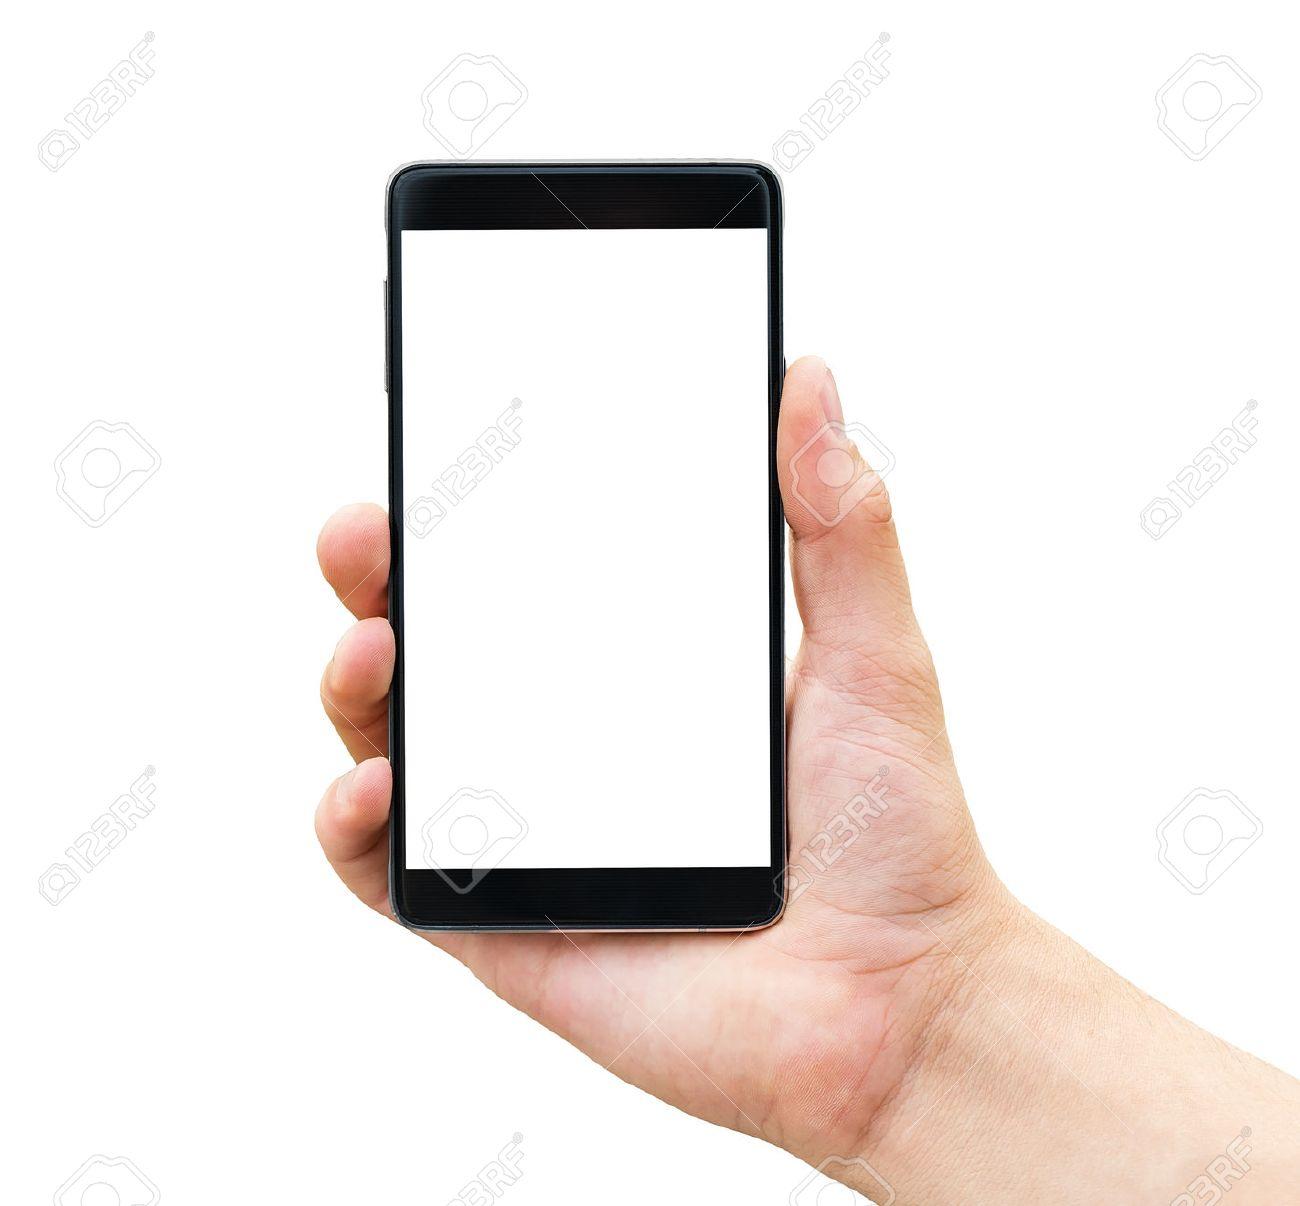 hand holding mobile smart